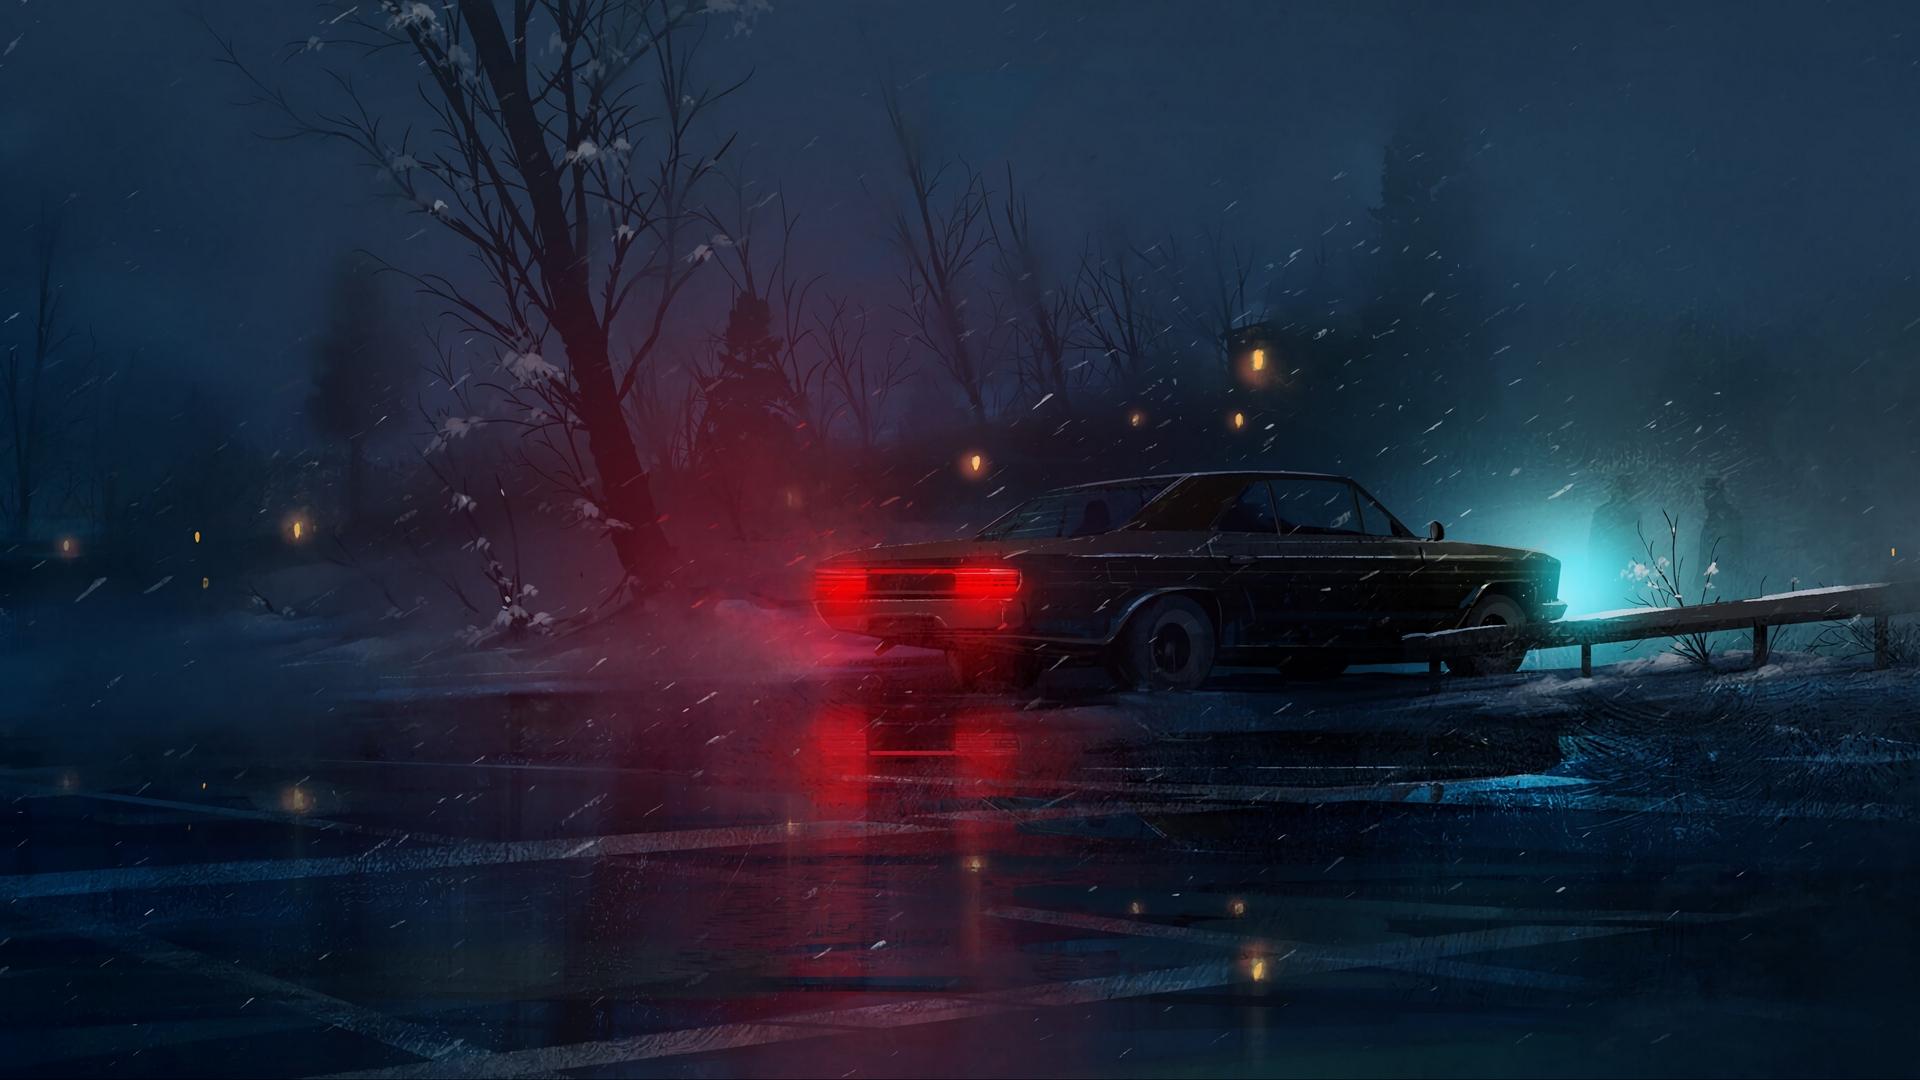 General 1920x1080 car night snow parking lot